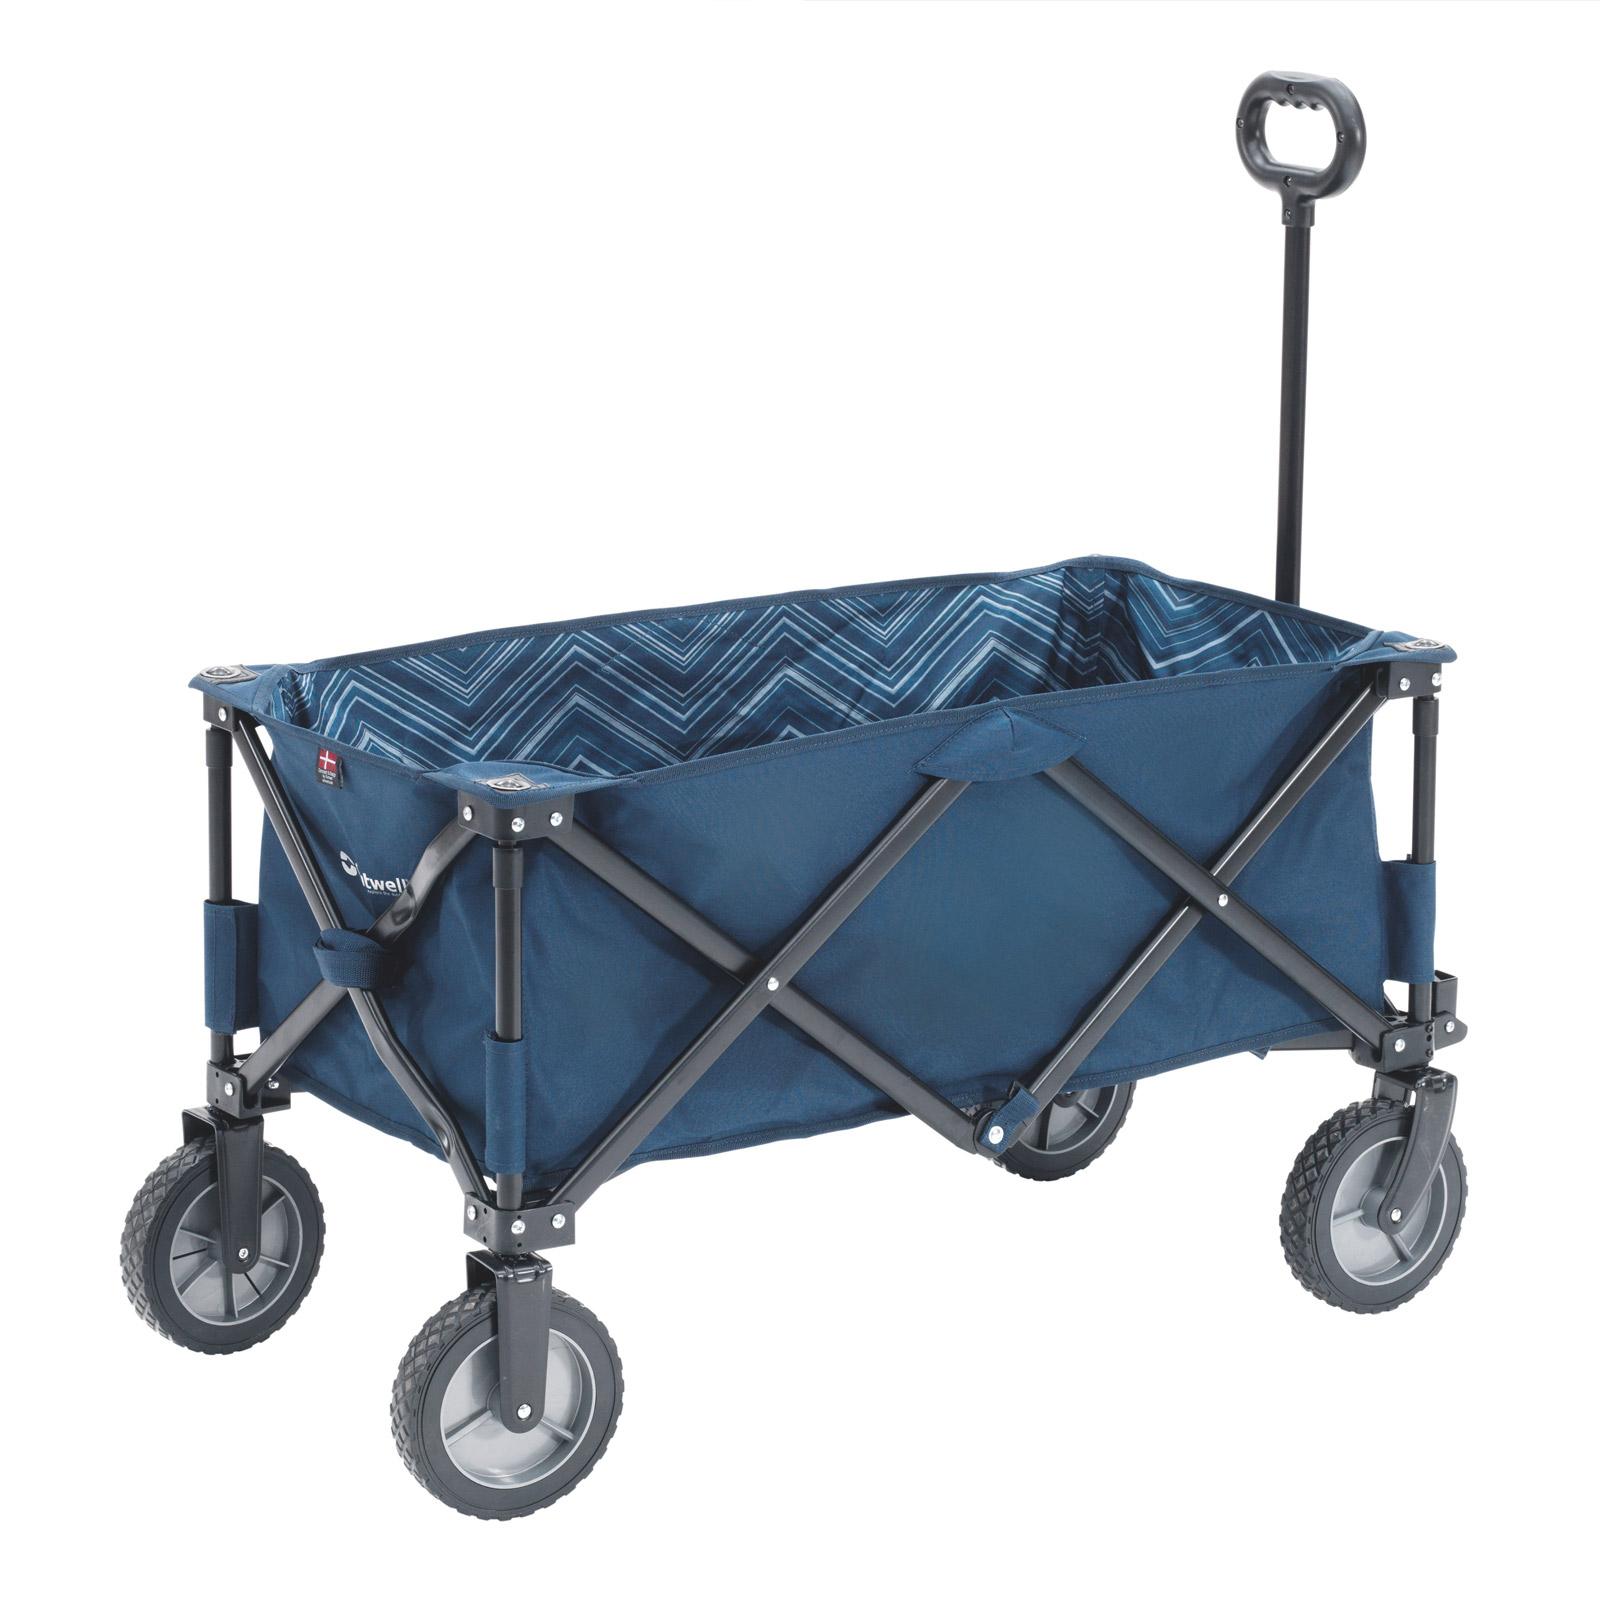 bollerwagen faltbar outwell transporter ziehwagen strandwagen leiterwagen ger te ebay. Black Bedroom Furniture Sets. Home Design Ideas